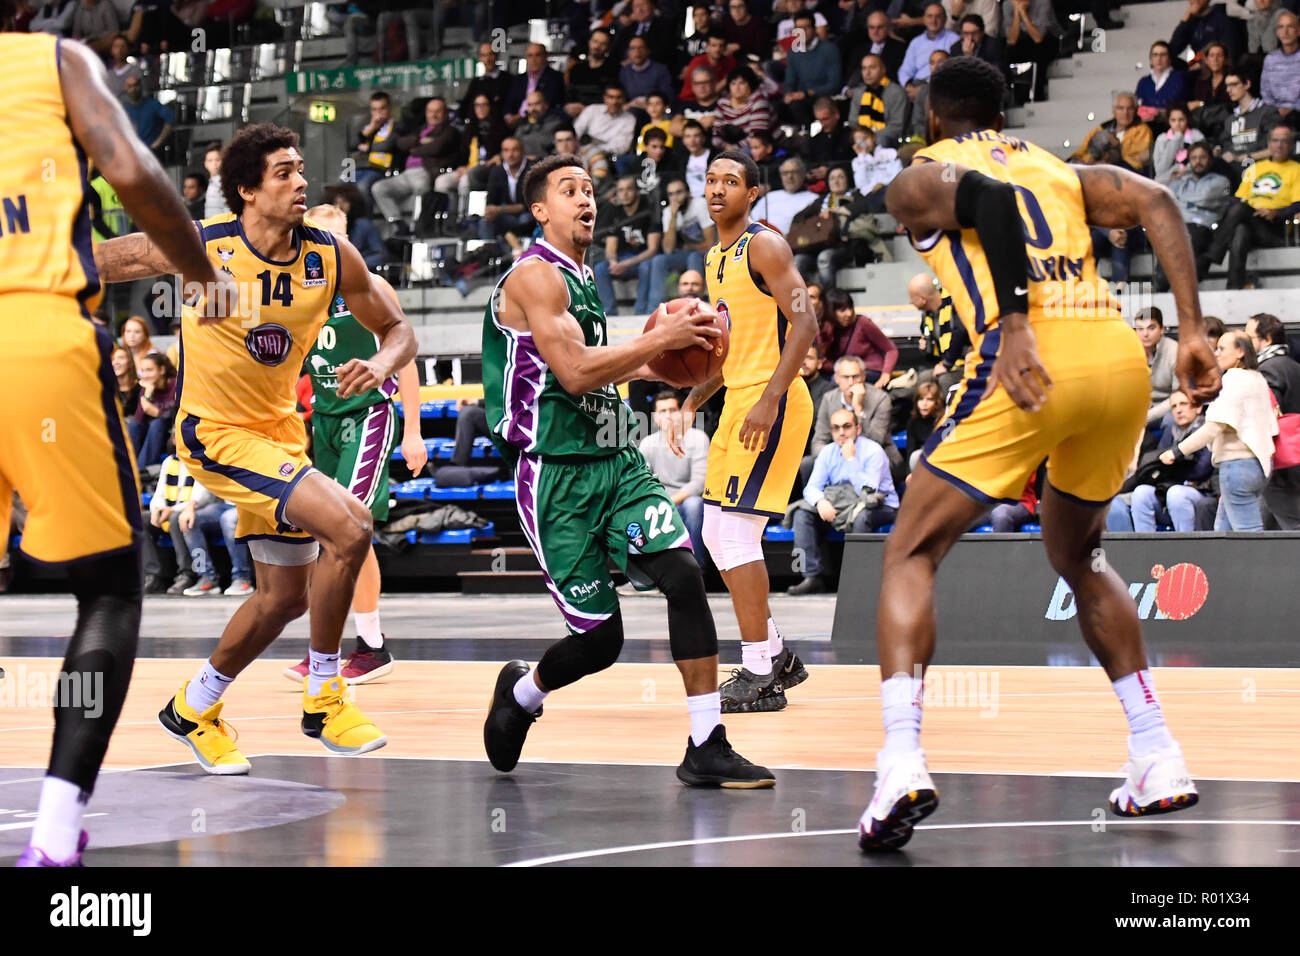 Turin, Italy. 31st Oct, 2018. Brian Roberts (Unicaja Malaga) during the 7 Days EuroCup 2018/19 basketball match between FIAT AUXILIUM TORINO VS UNICAJA MALAGA at PalaVela on 31 October, 2018 in Turin, Italy. Credit: FABIO PETROSINO/Alamy Live News - Stock Image